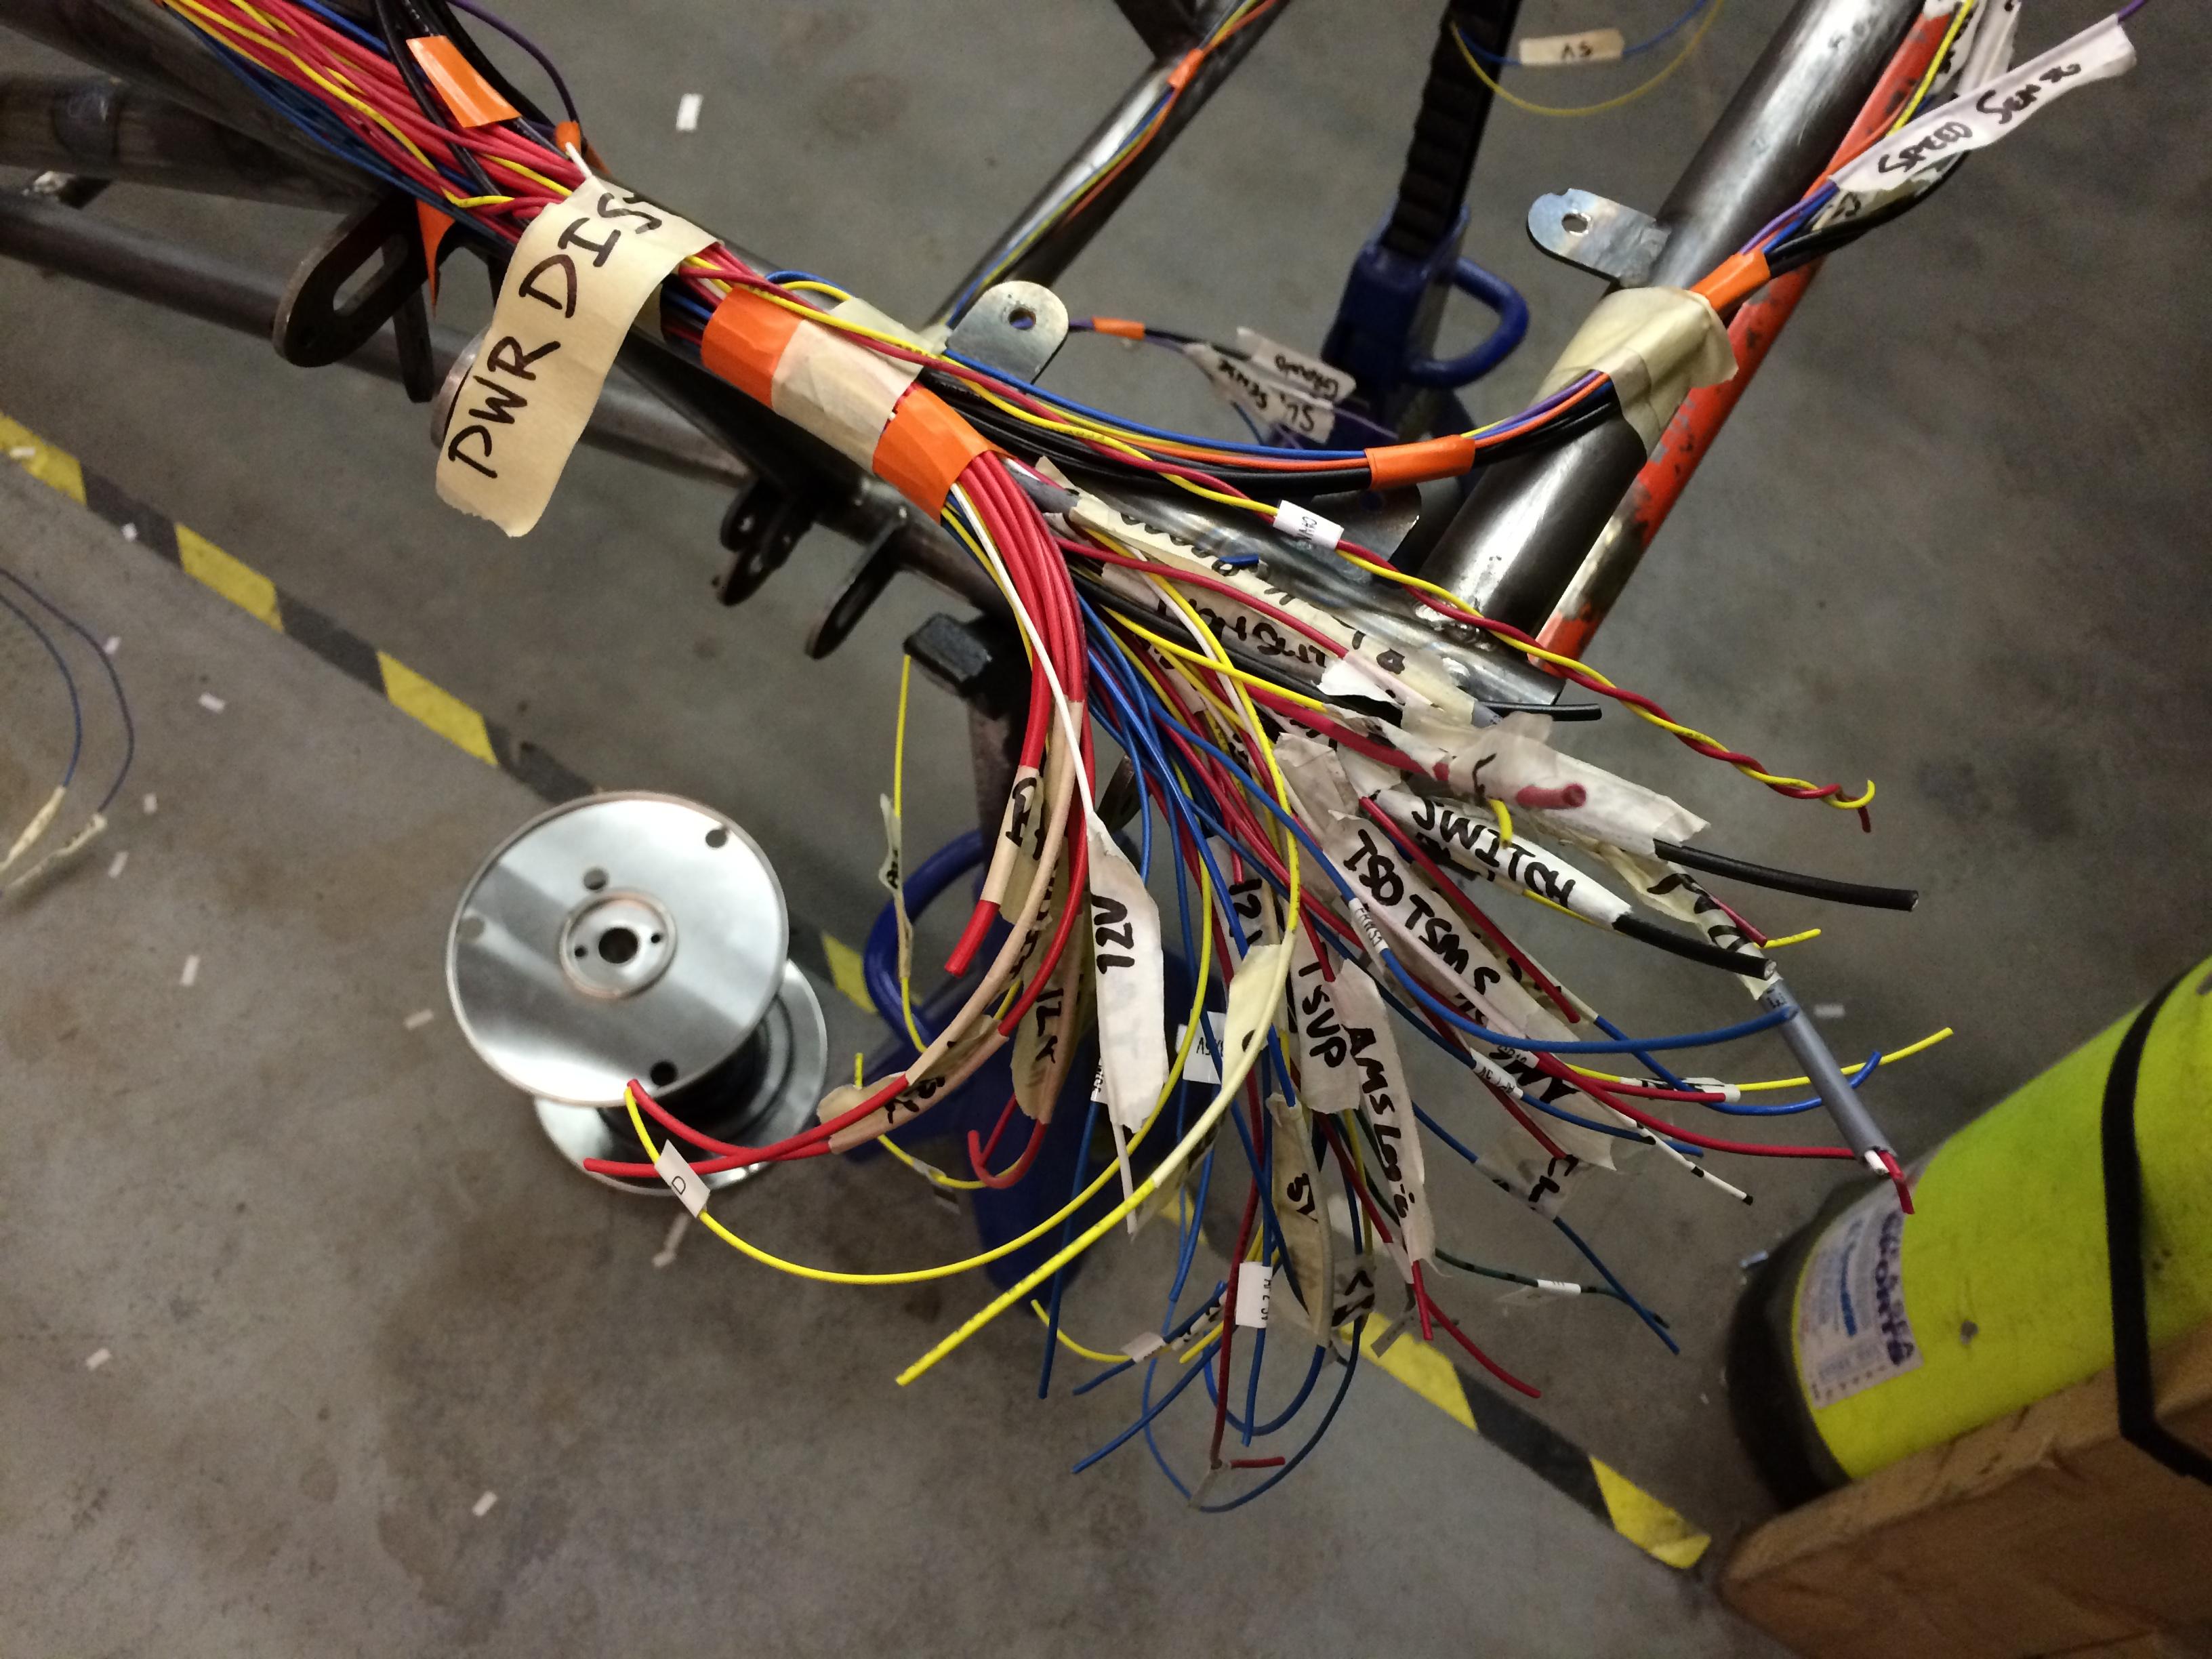 yf_8852] wire harness routing schematic wiring  arch xeira mohammedshrine librar wiring 101